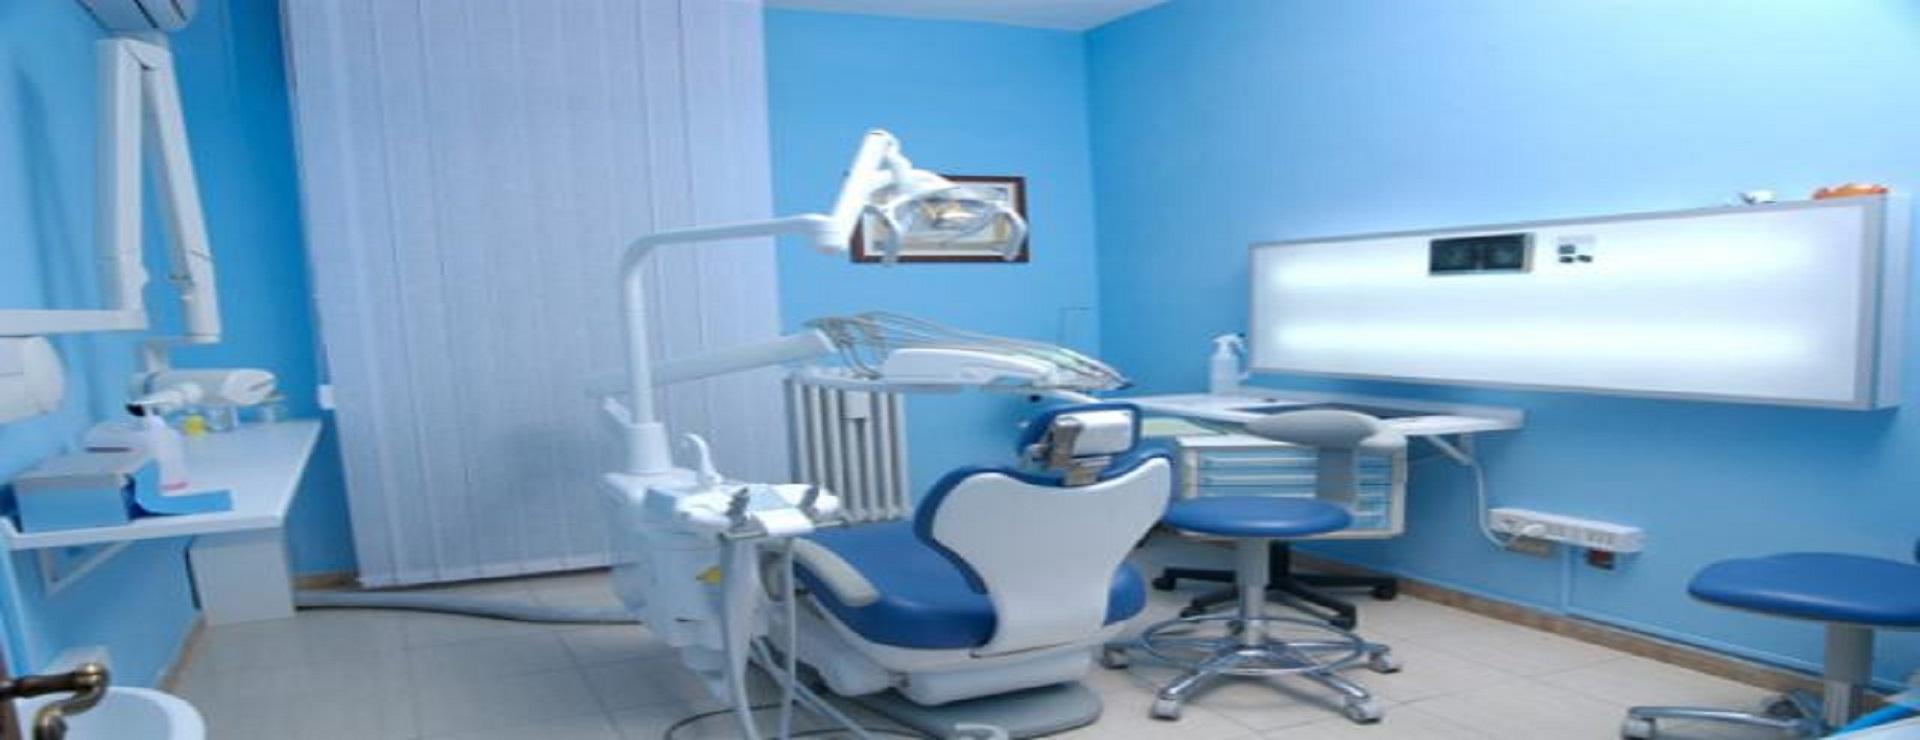 Dentist office smell 6